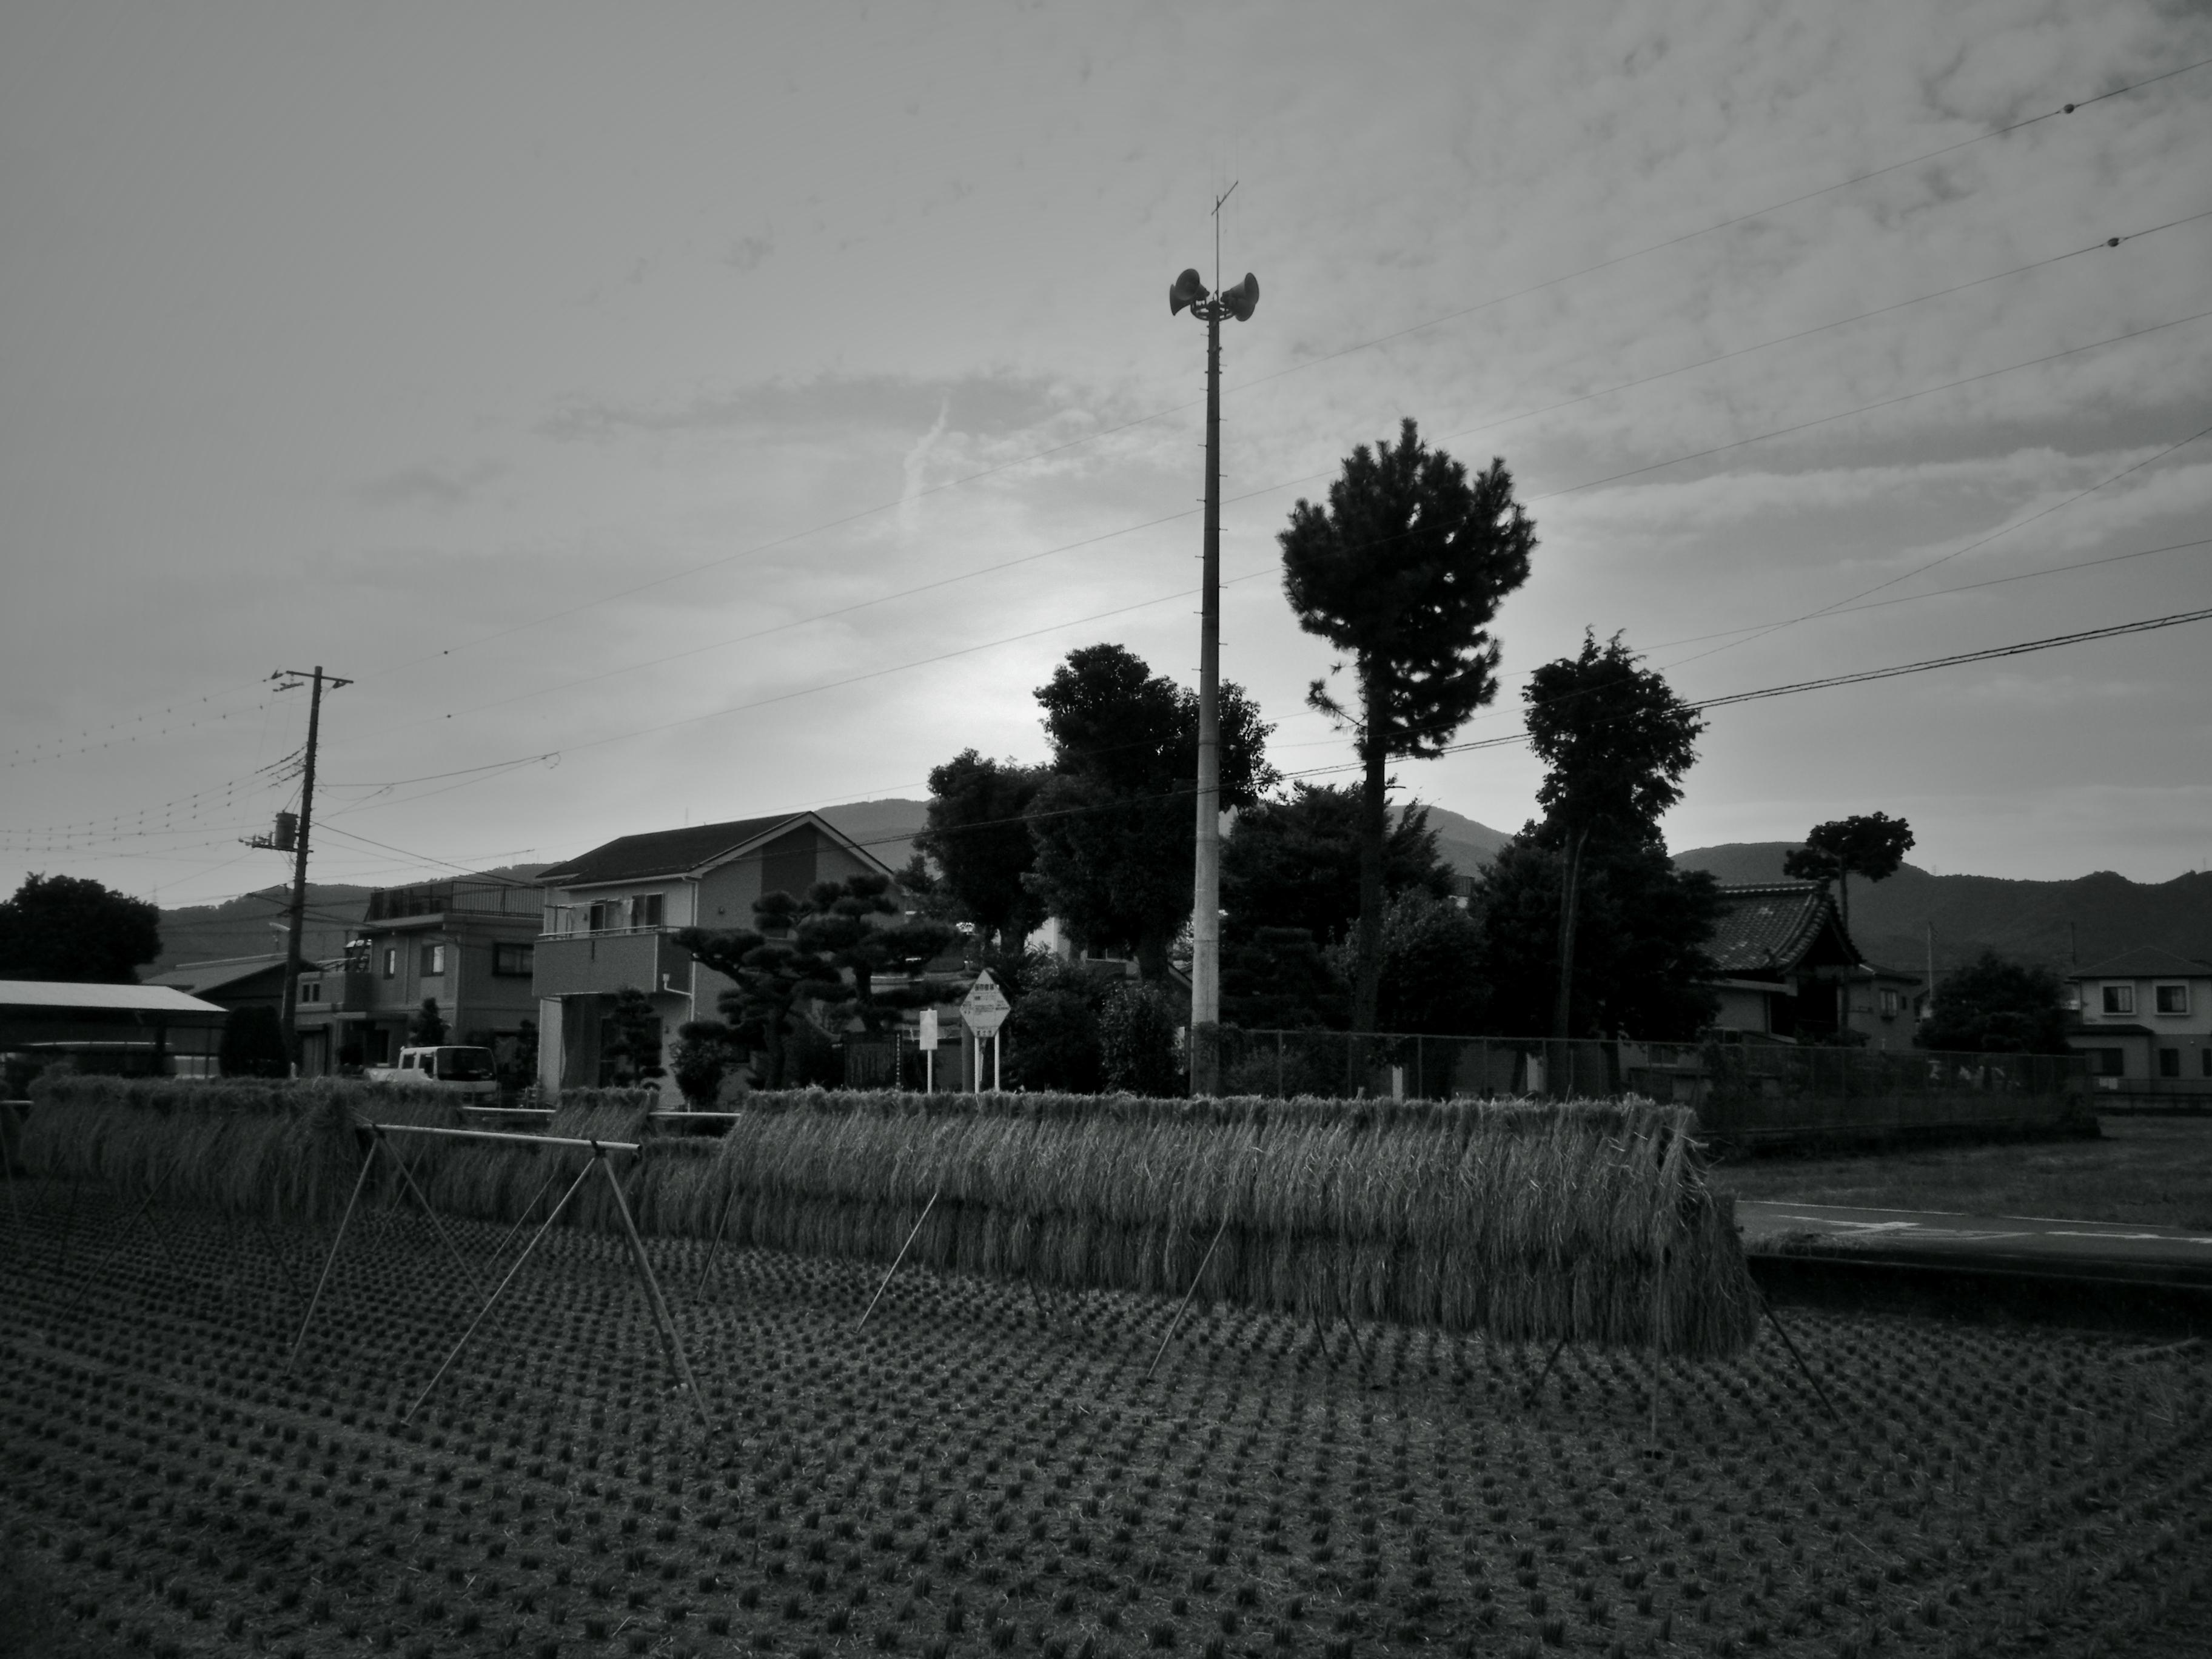 08/01/17